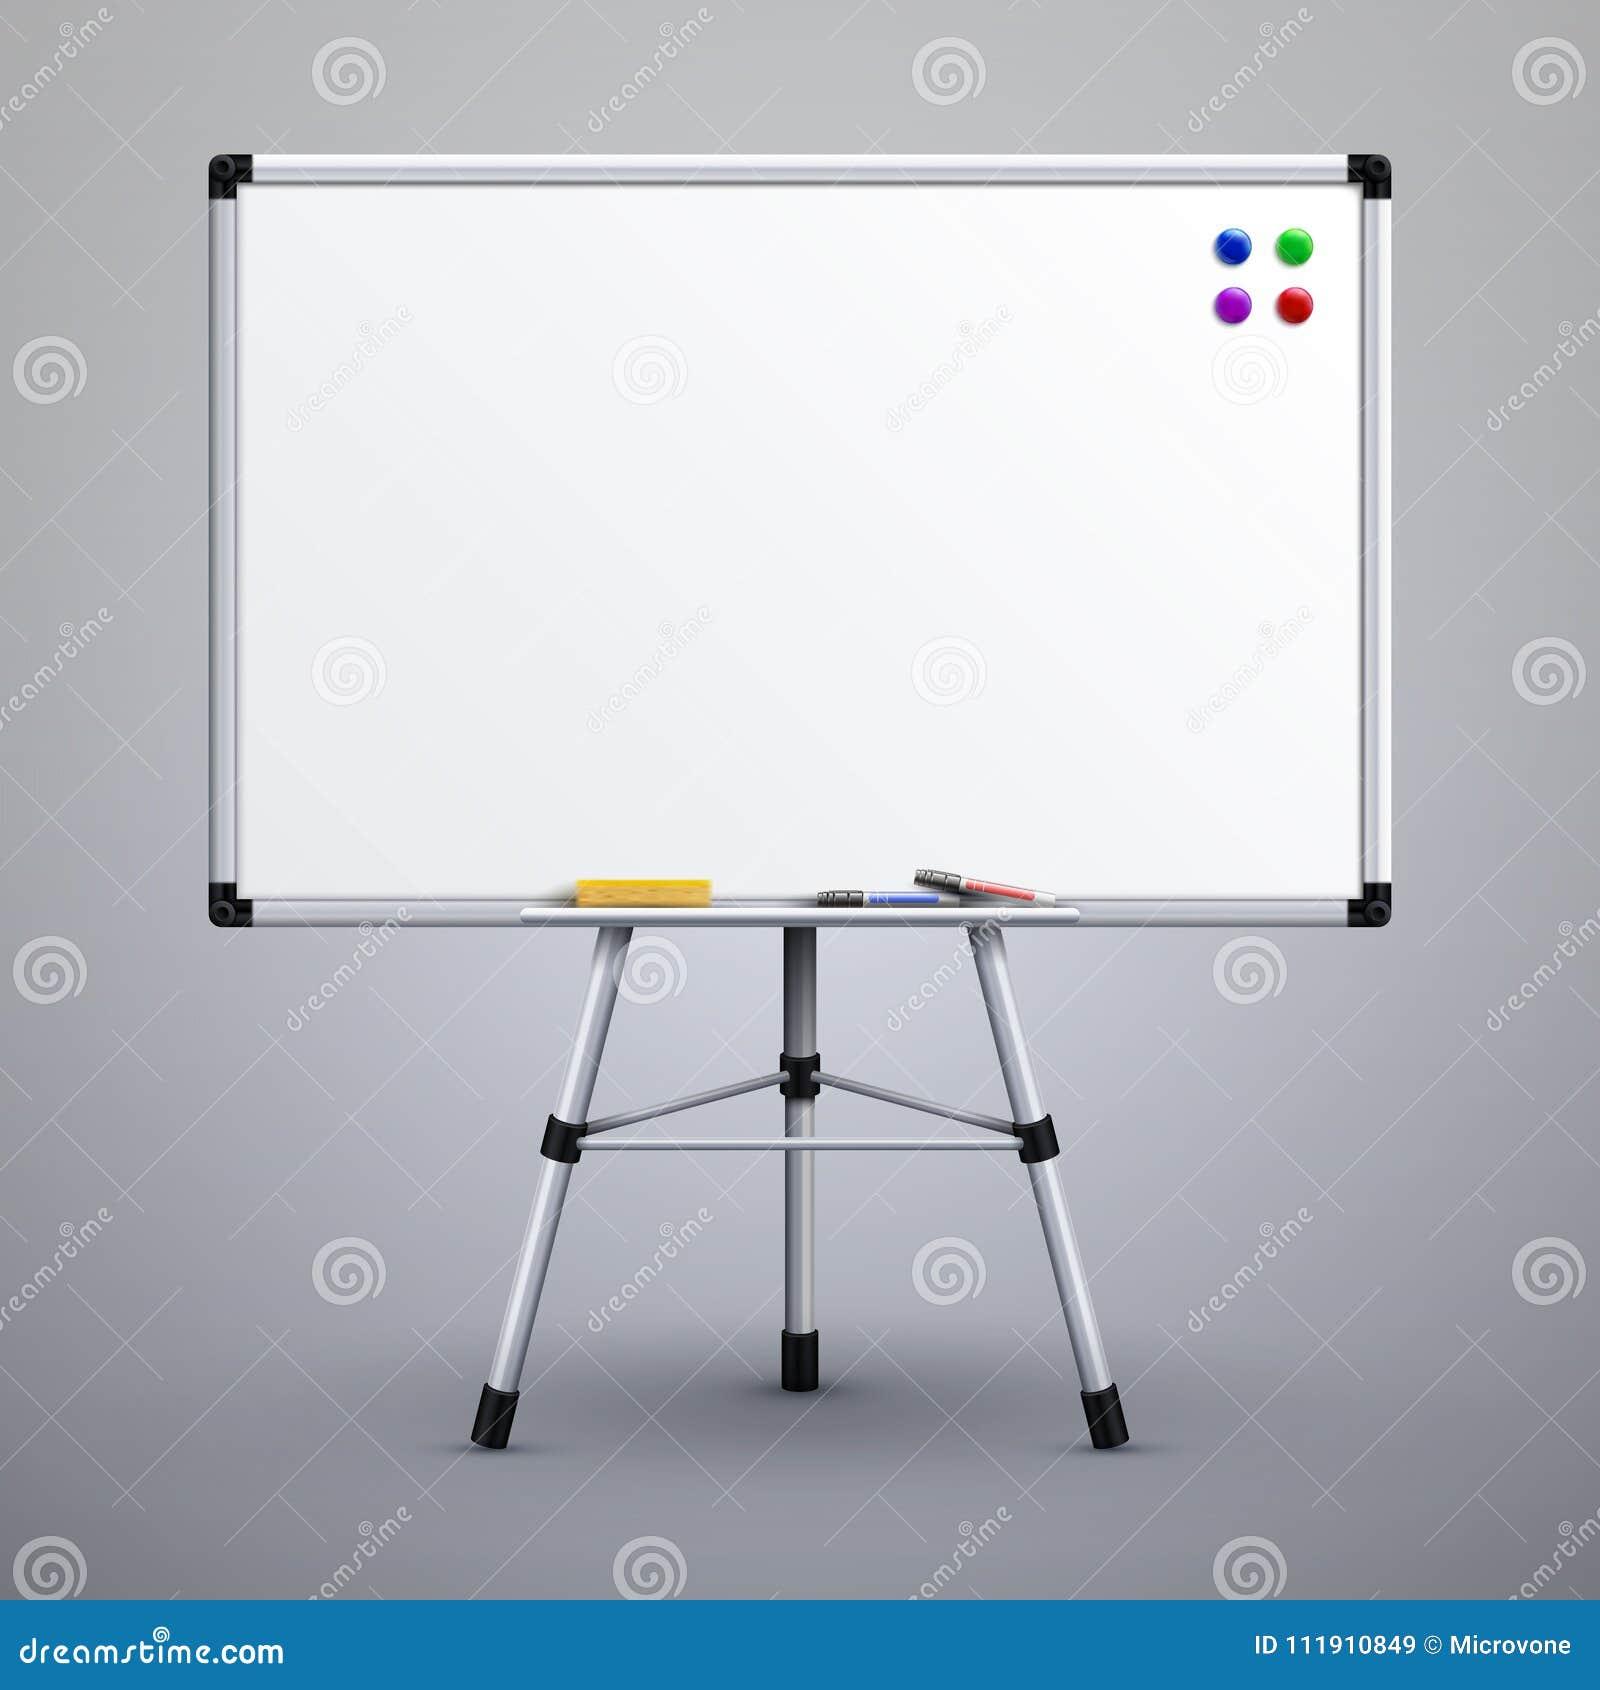 office presentation whiteboard on tripod blank classroom white